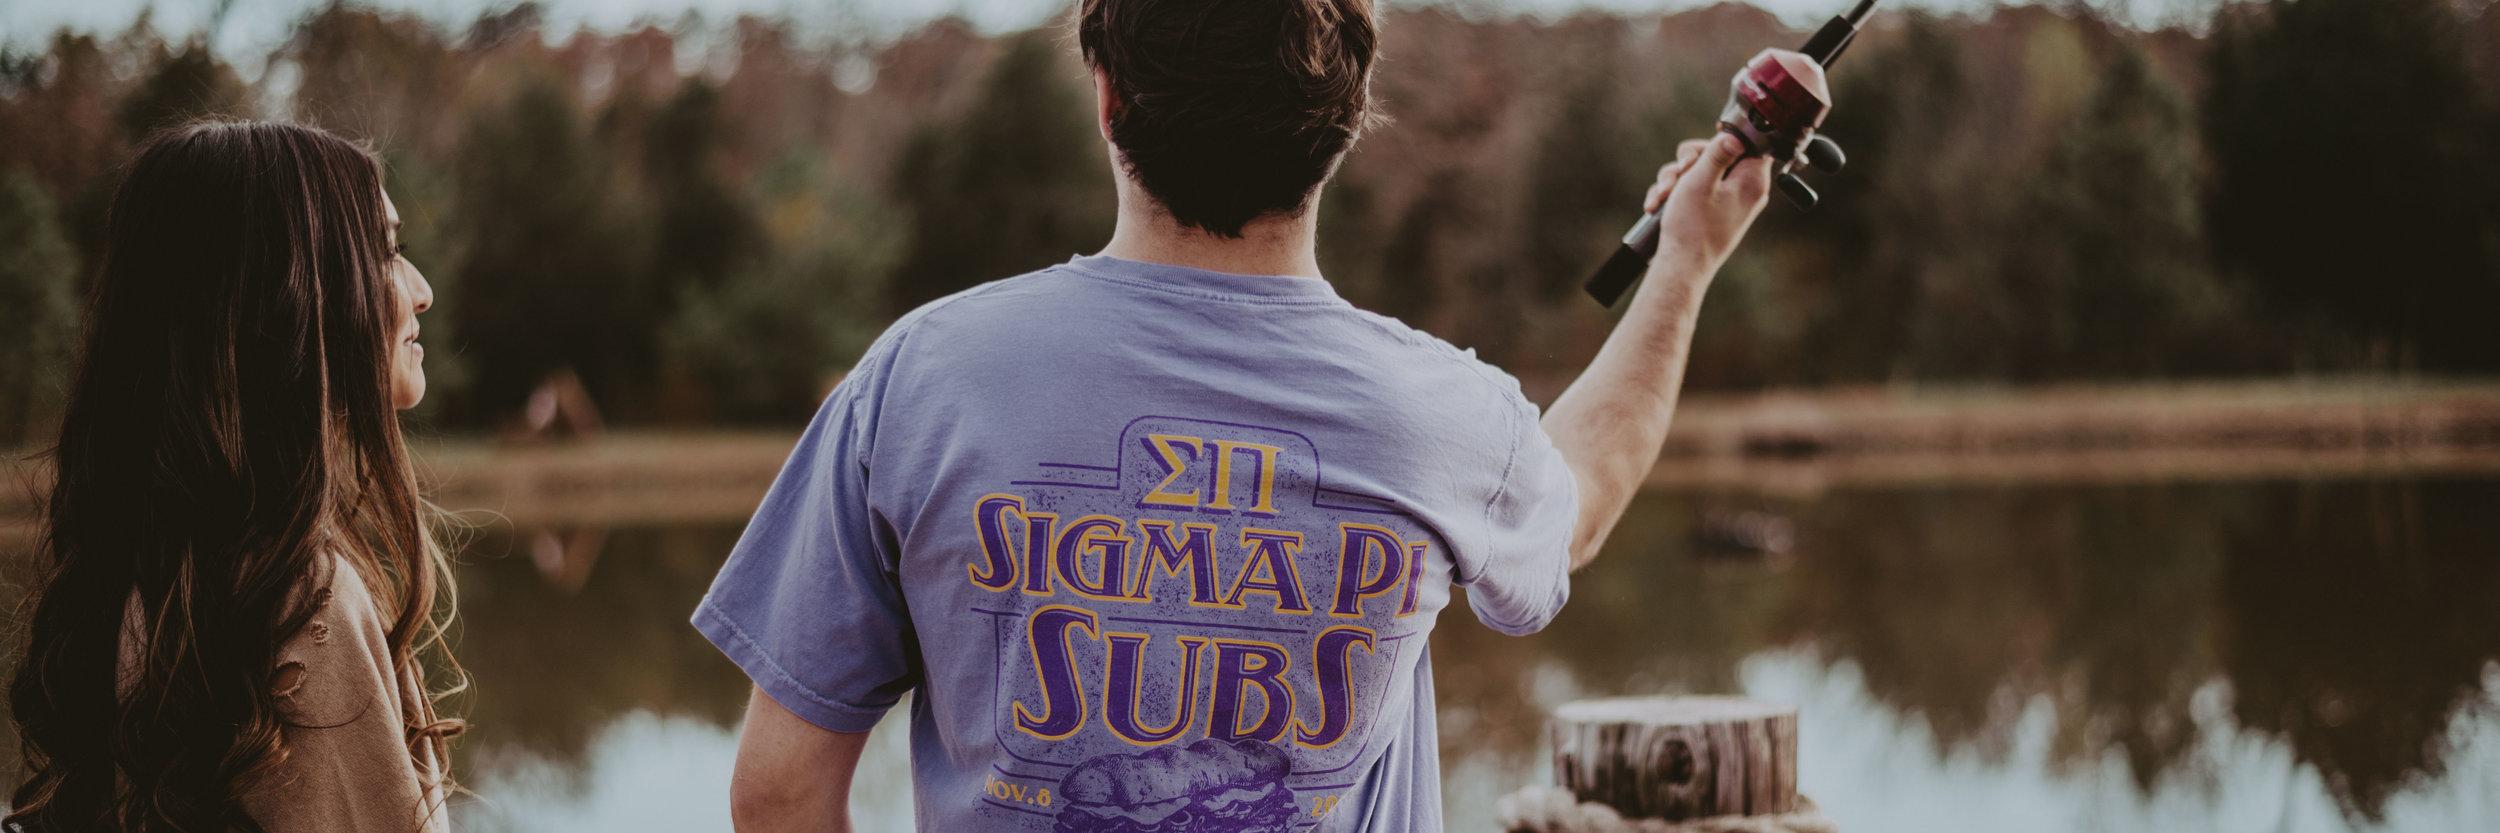 Philanthropy Tshirt Designs -